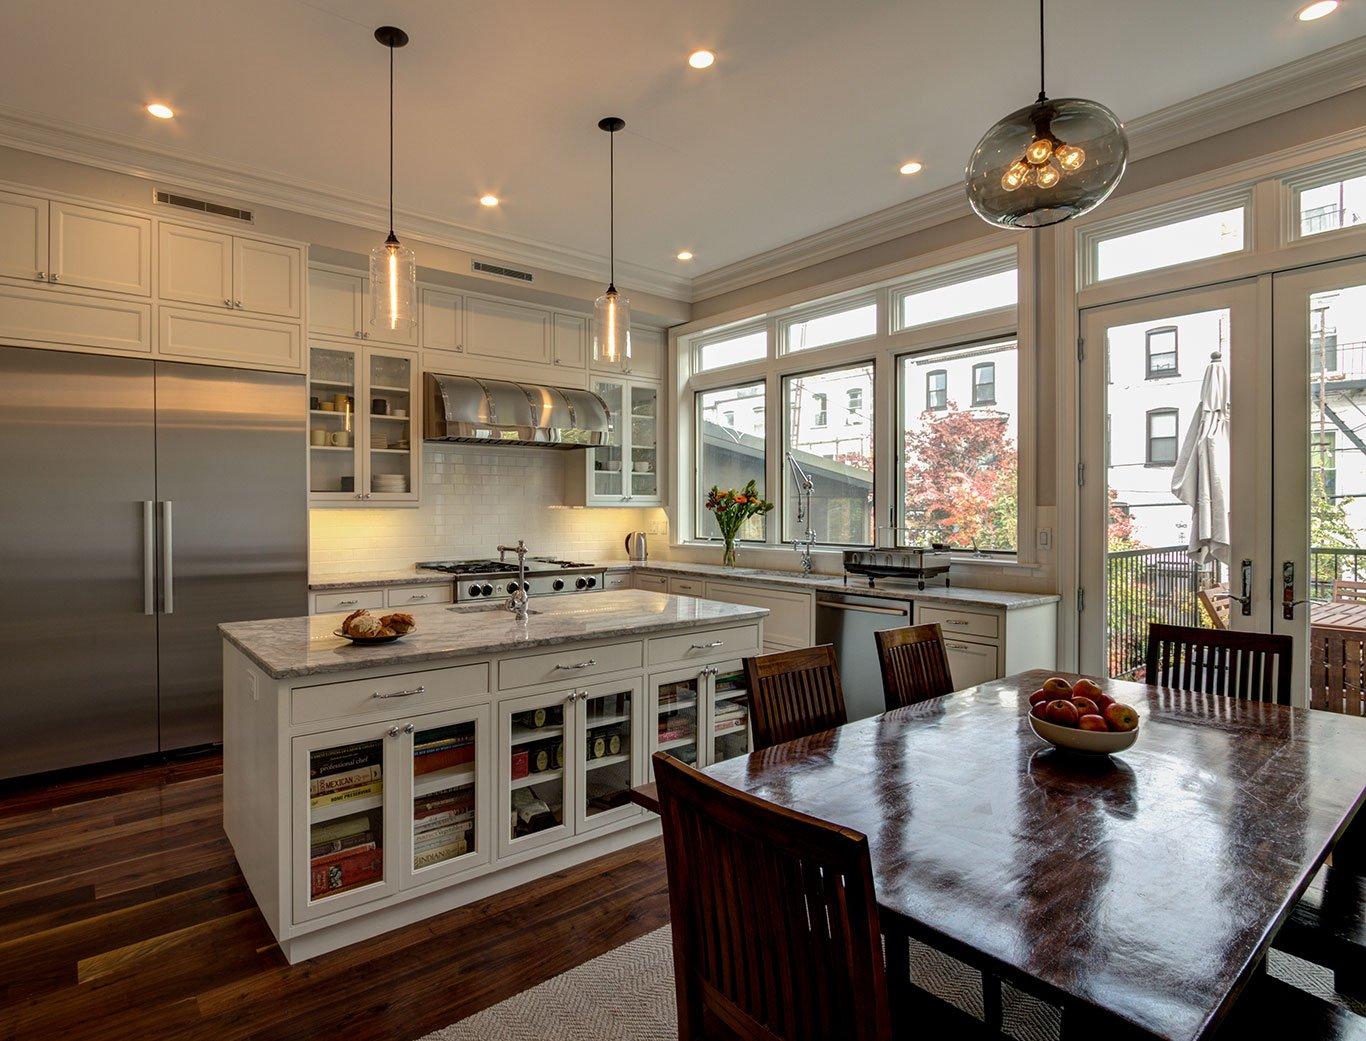 Niche Modern Pendants find a home in Brooklyn